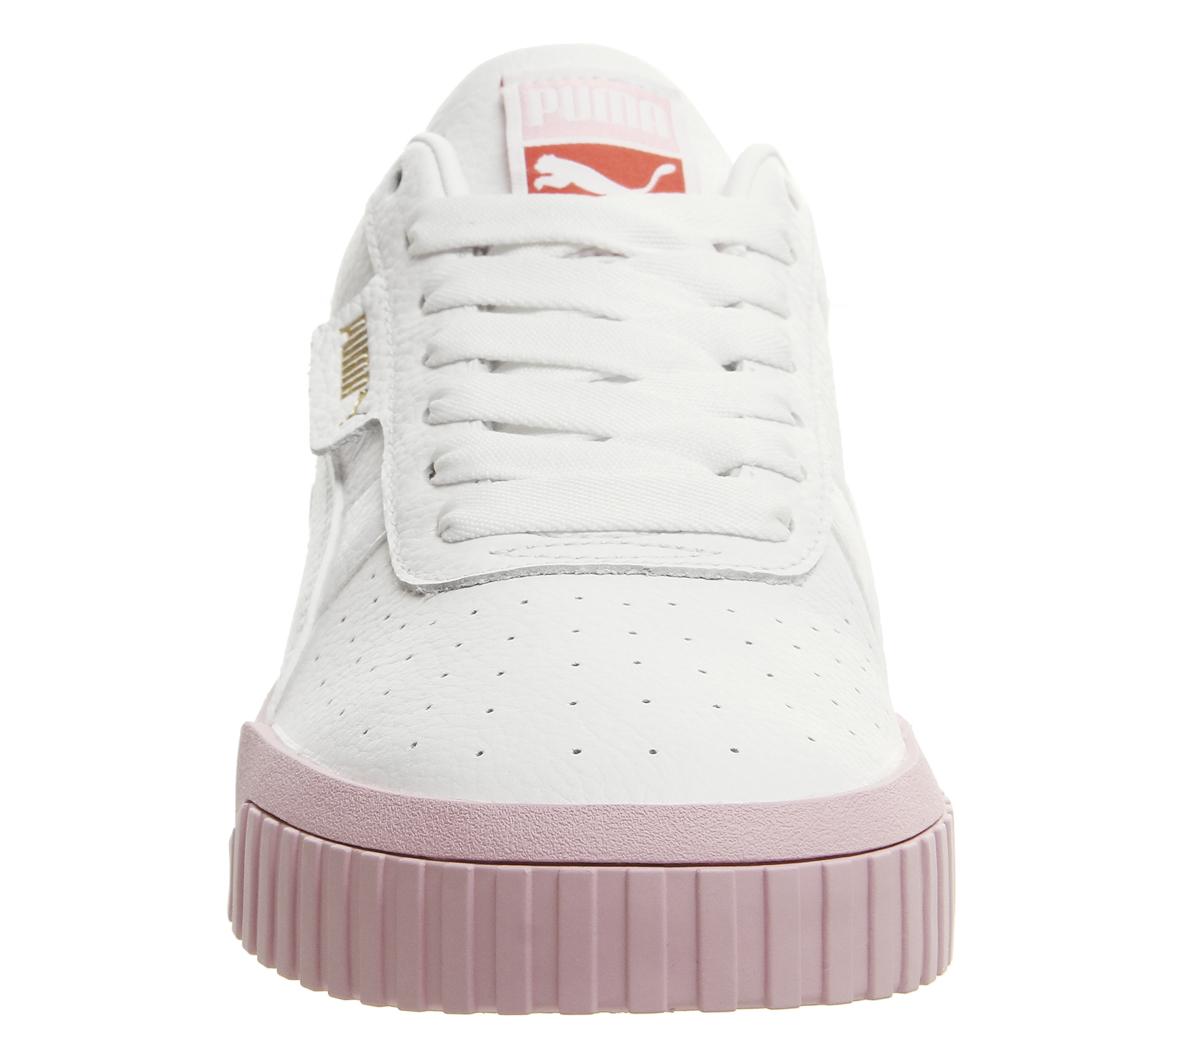 42bfe882d7d5 Sentinel Womens Puma Cali Trainers Puma White Pink Trainers Shoes